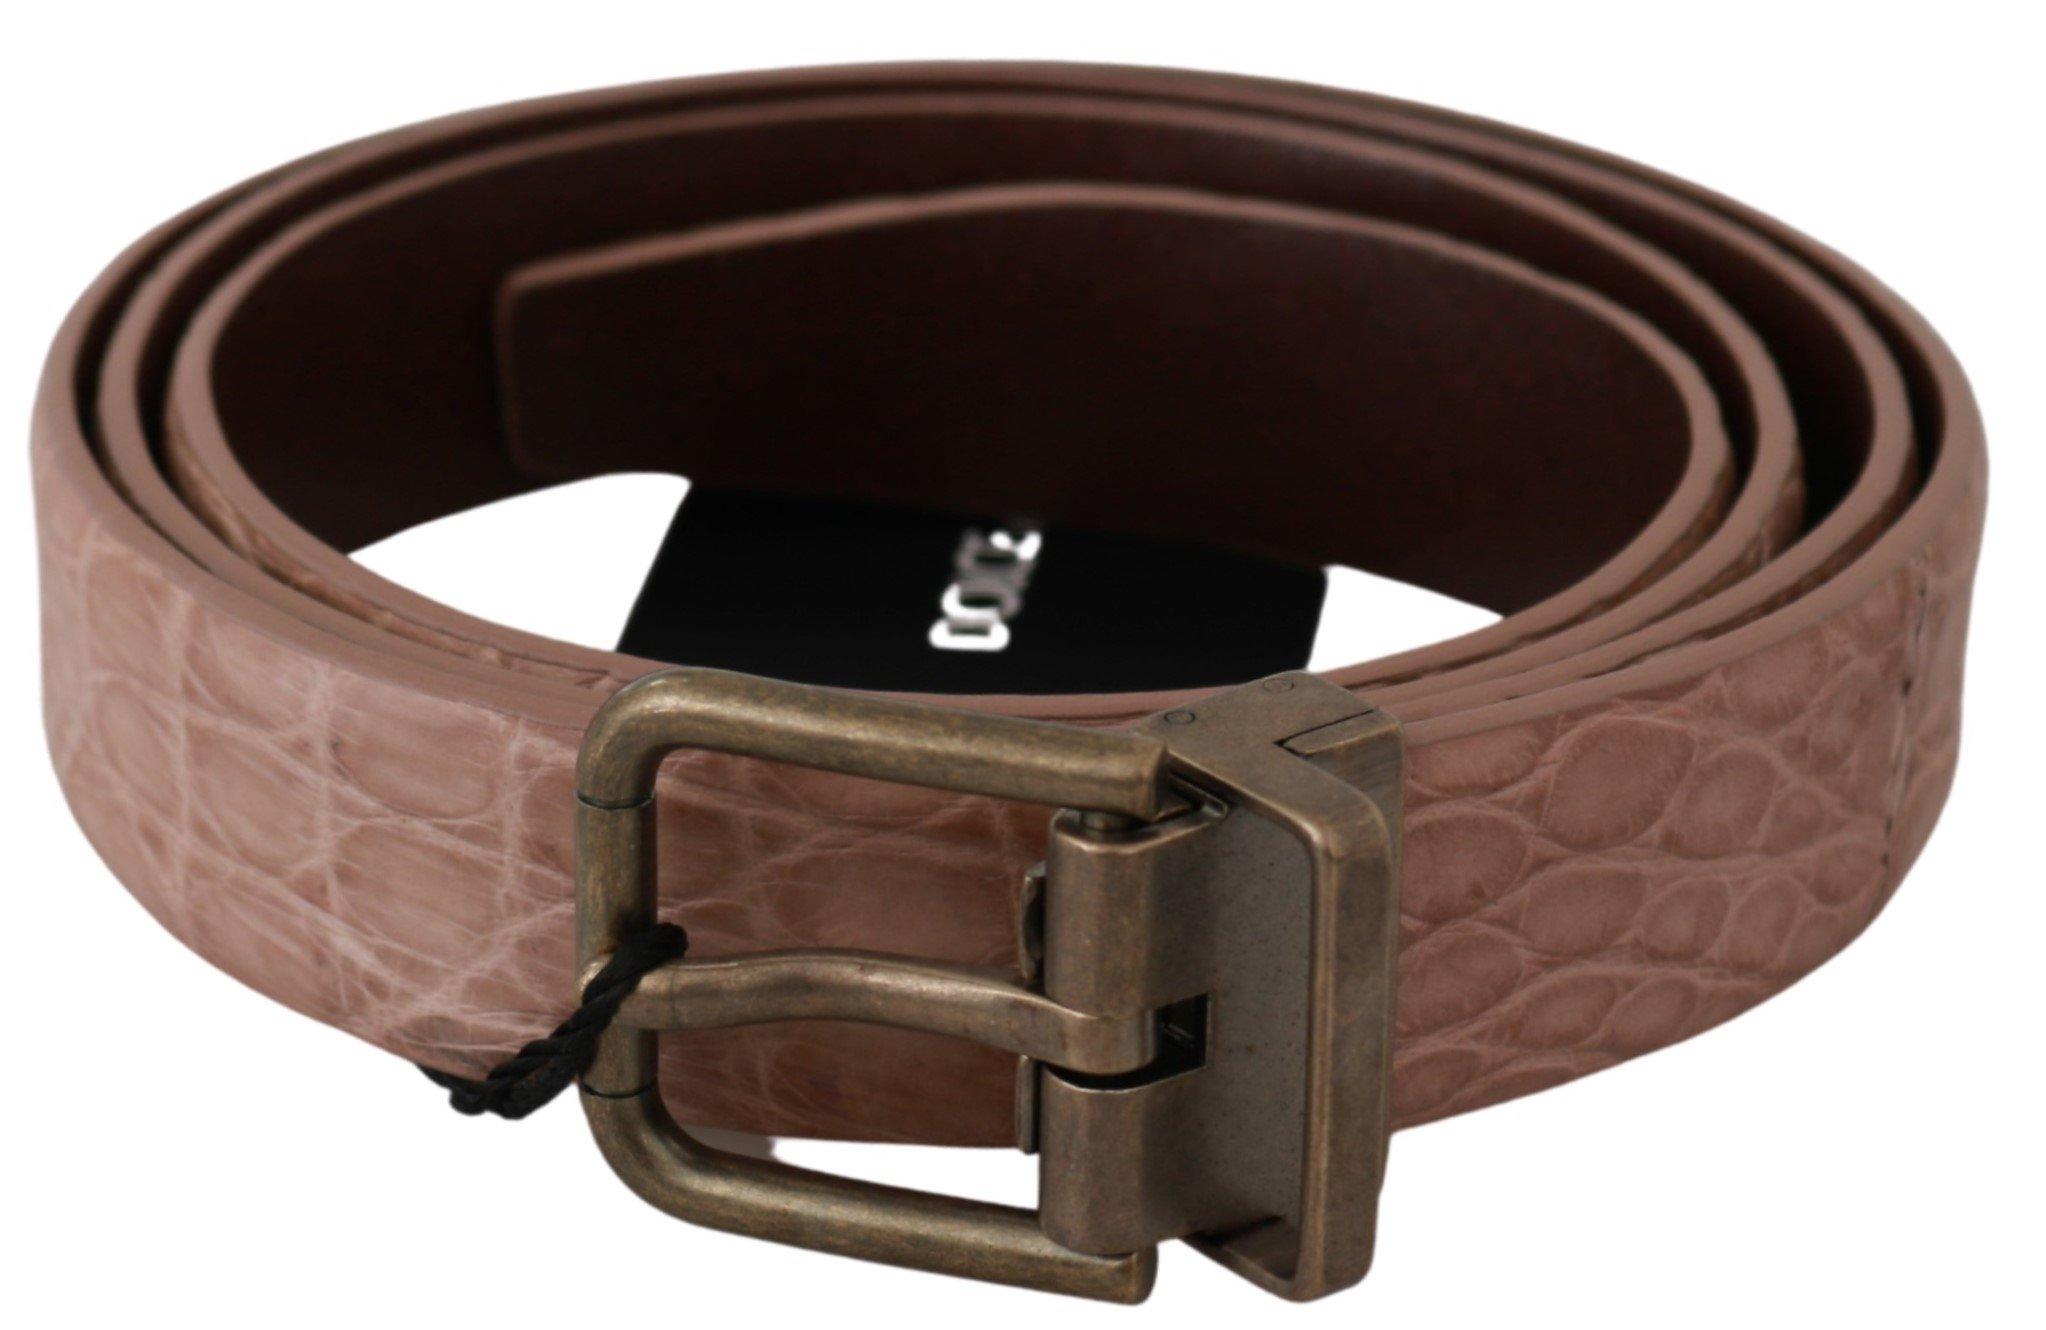 Dolce & Gabbana Men's Exotic Skin Buckle Leather Belt Beige BEL60604 - 100 cm / 40 Inches